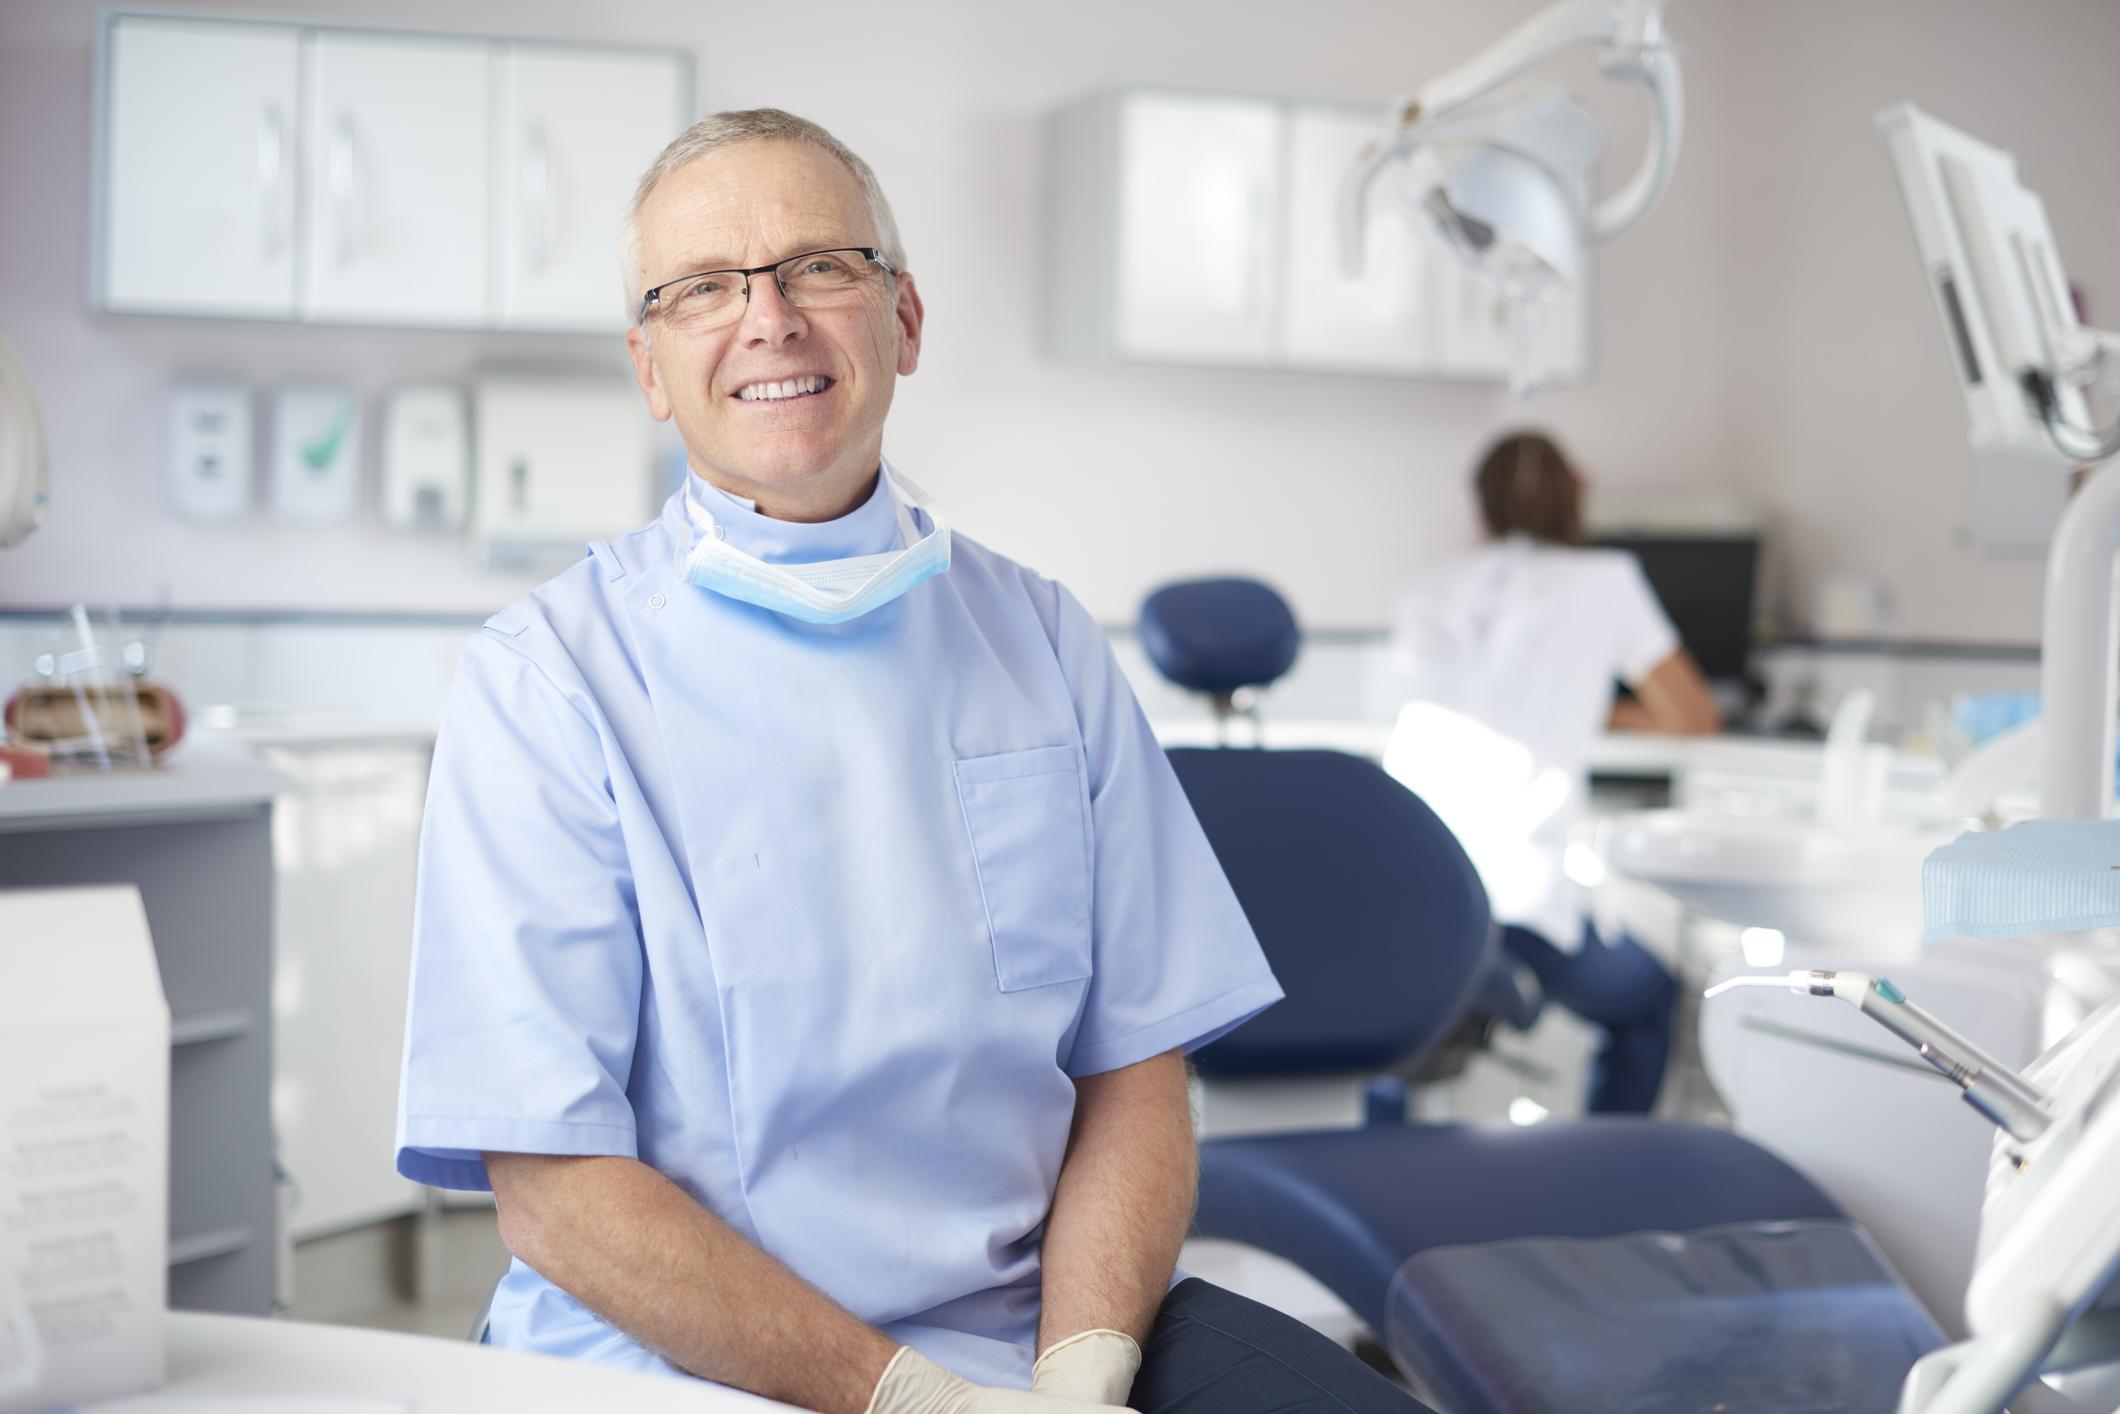 Photo of male dentist